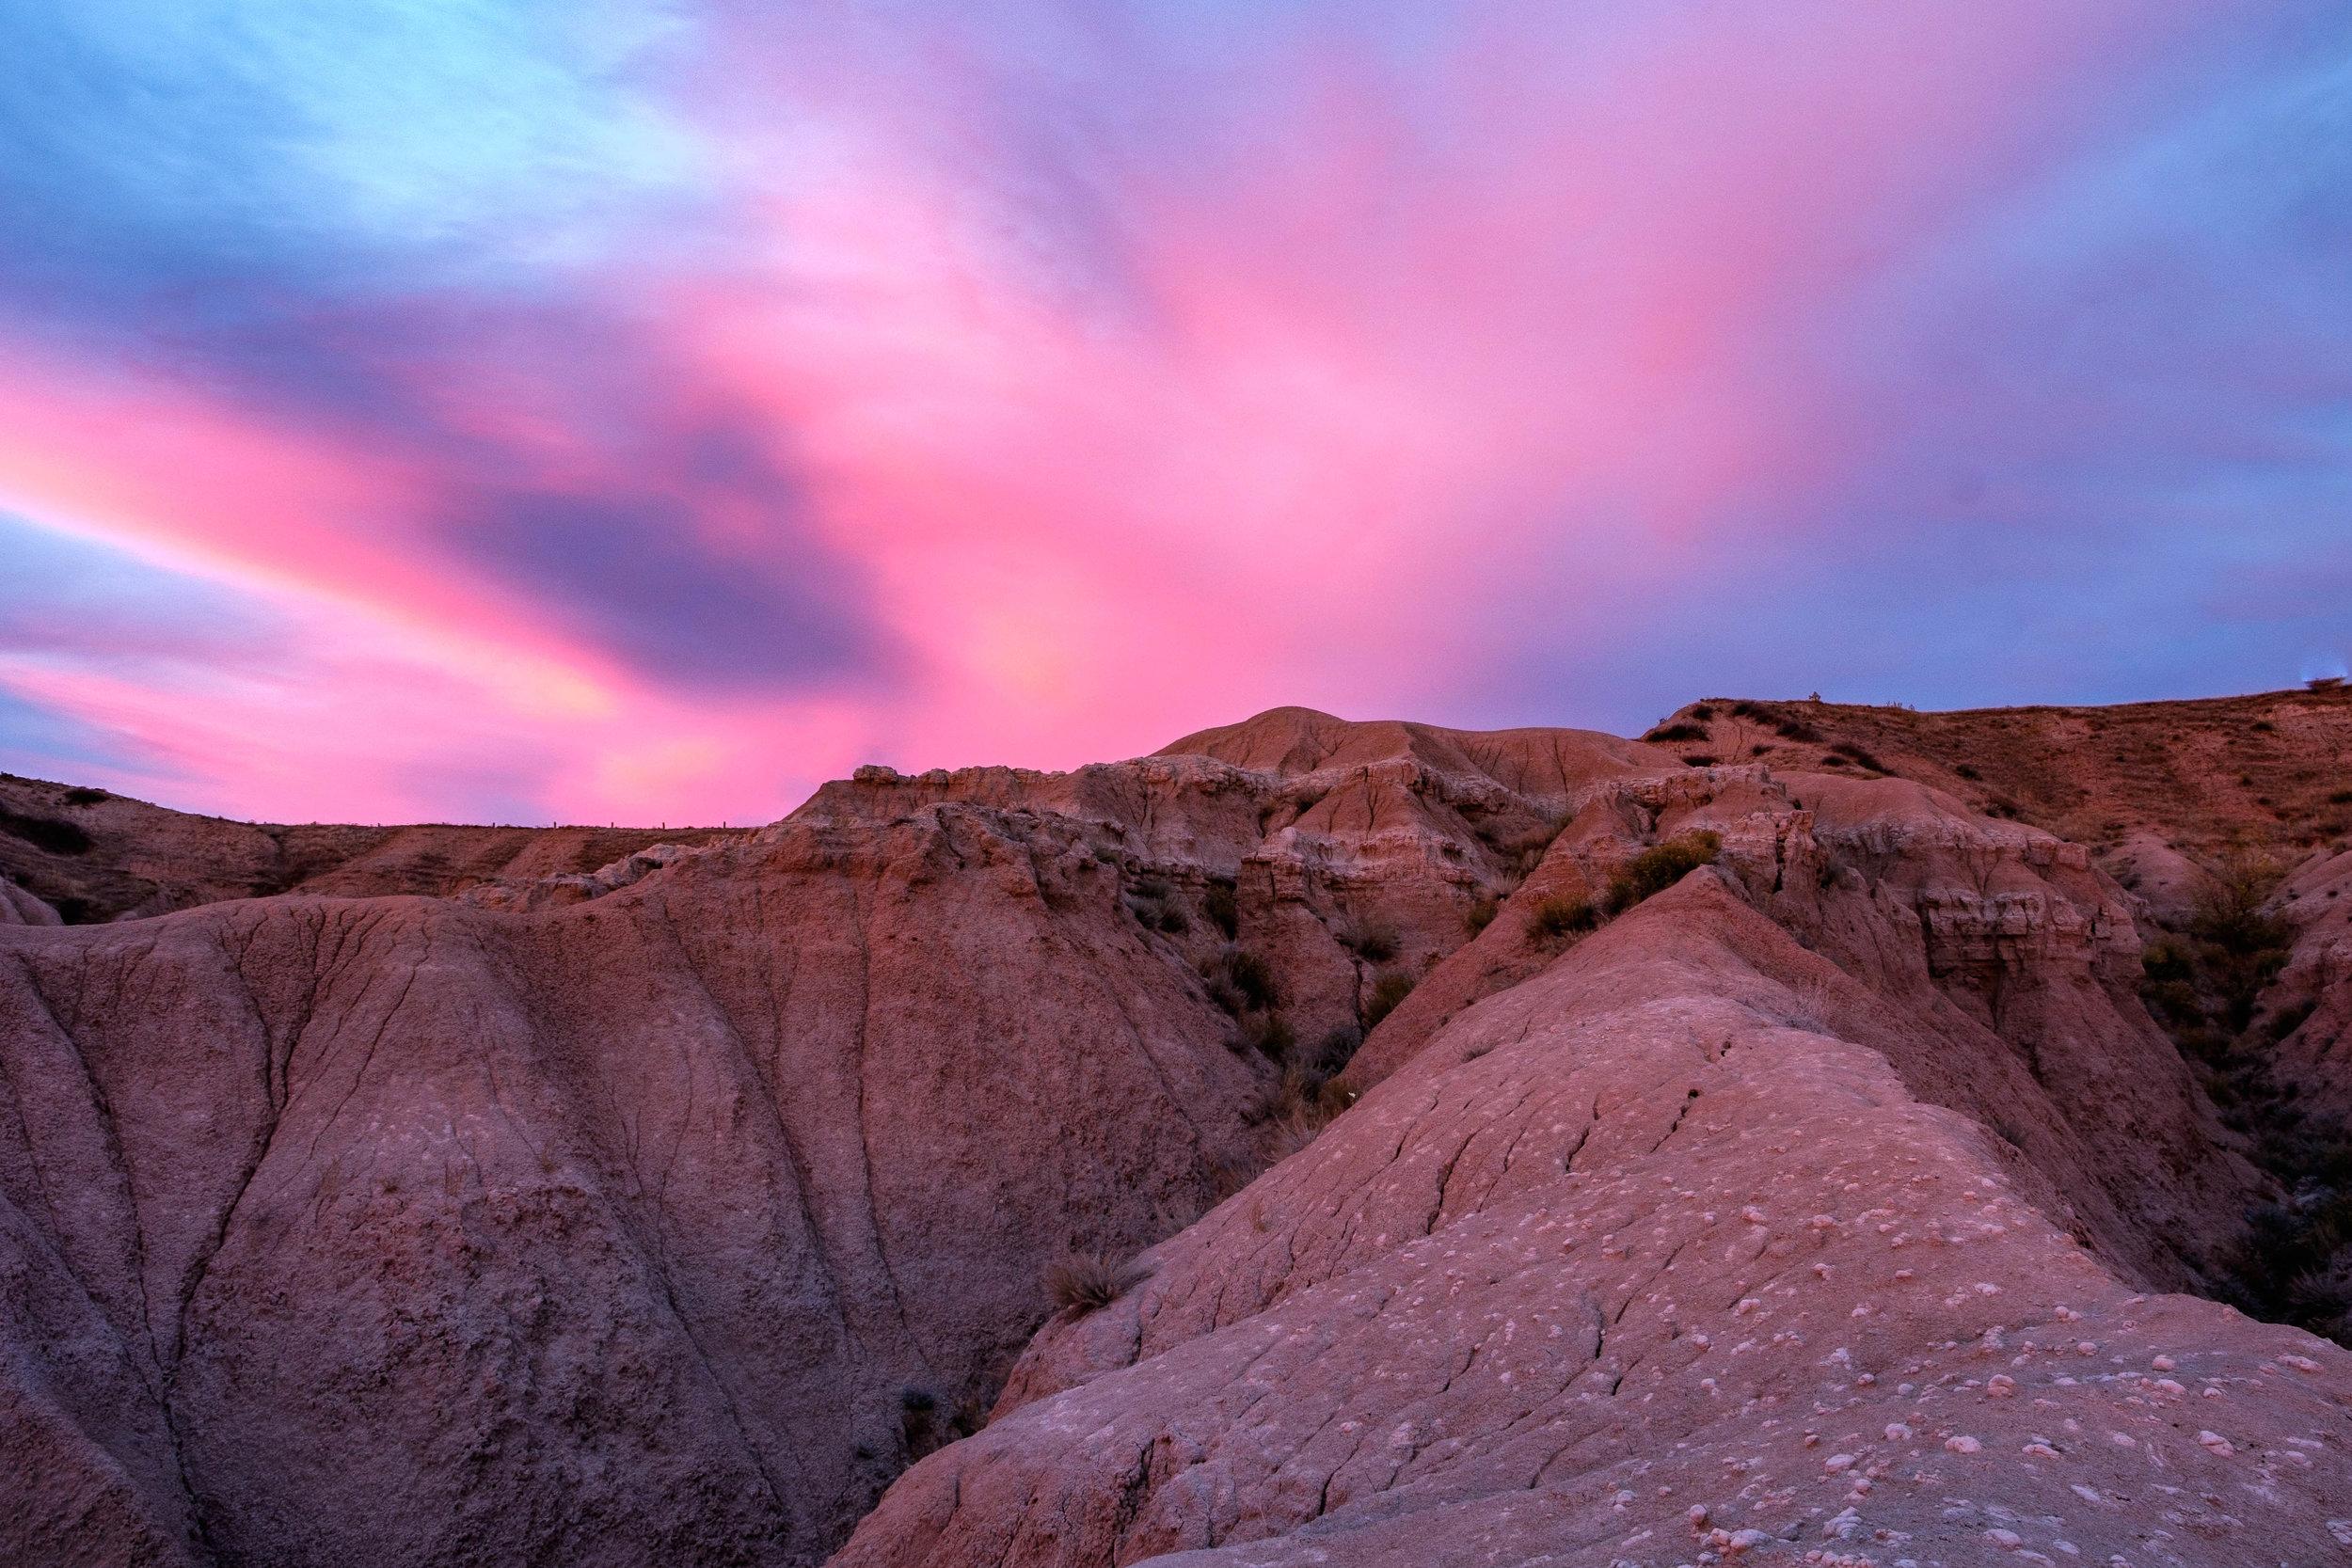 Pretty sunset sky in Badlands National Park in South Dakota.